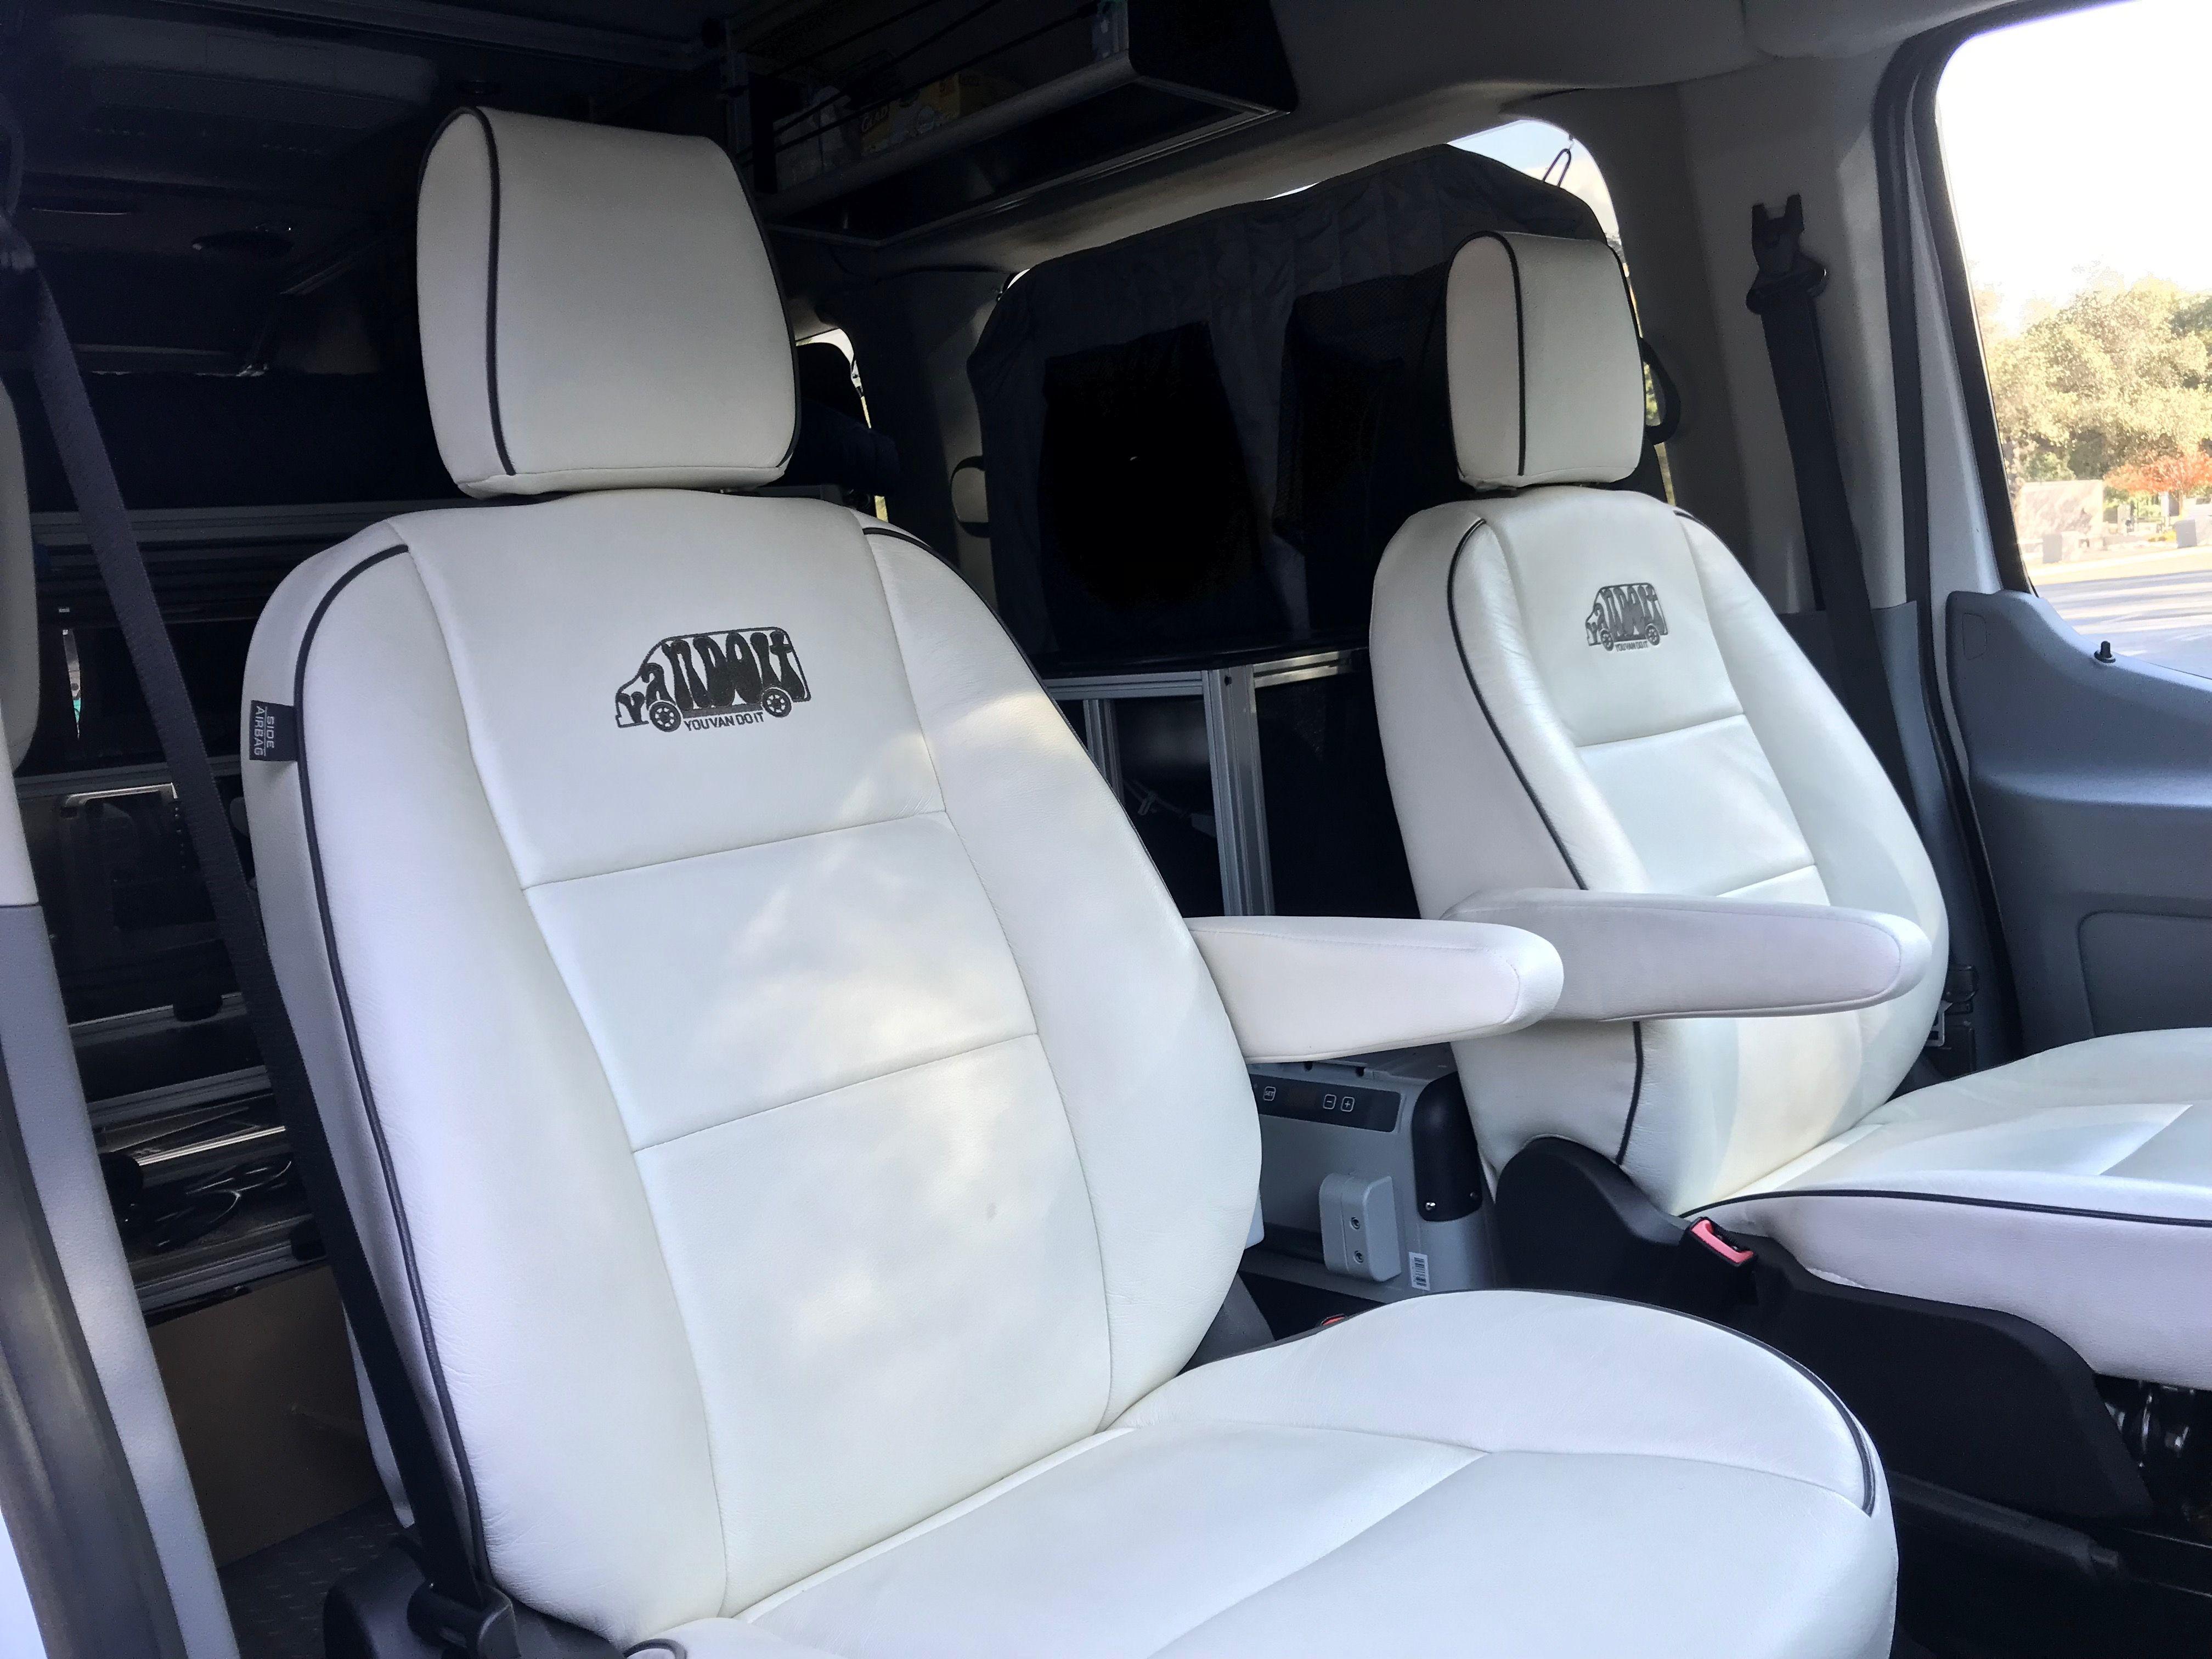 You Van Choose Your Dream Interior With Vandoit Custominterior